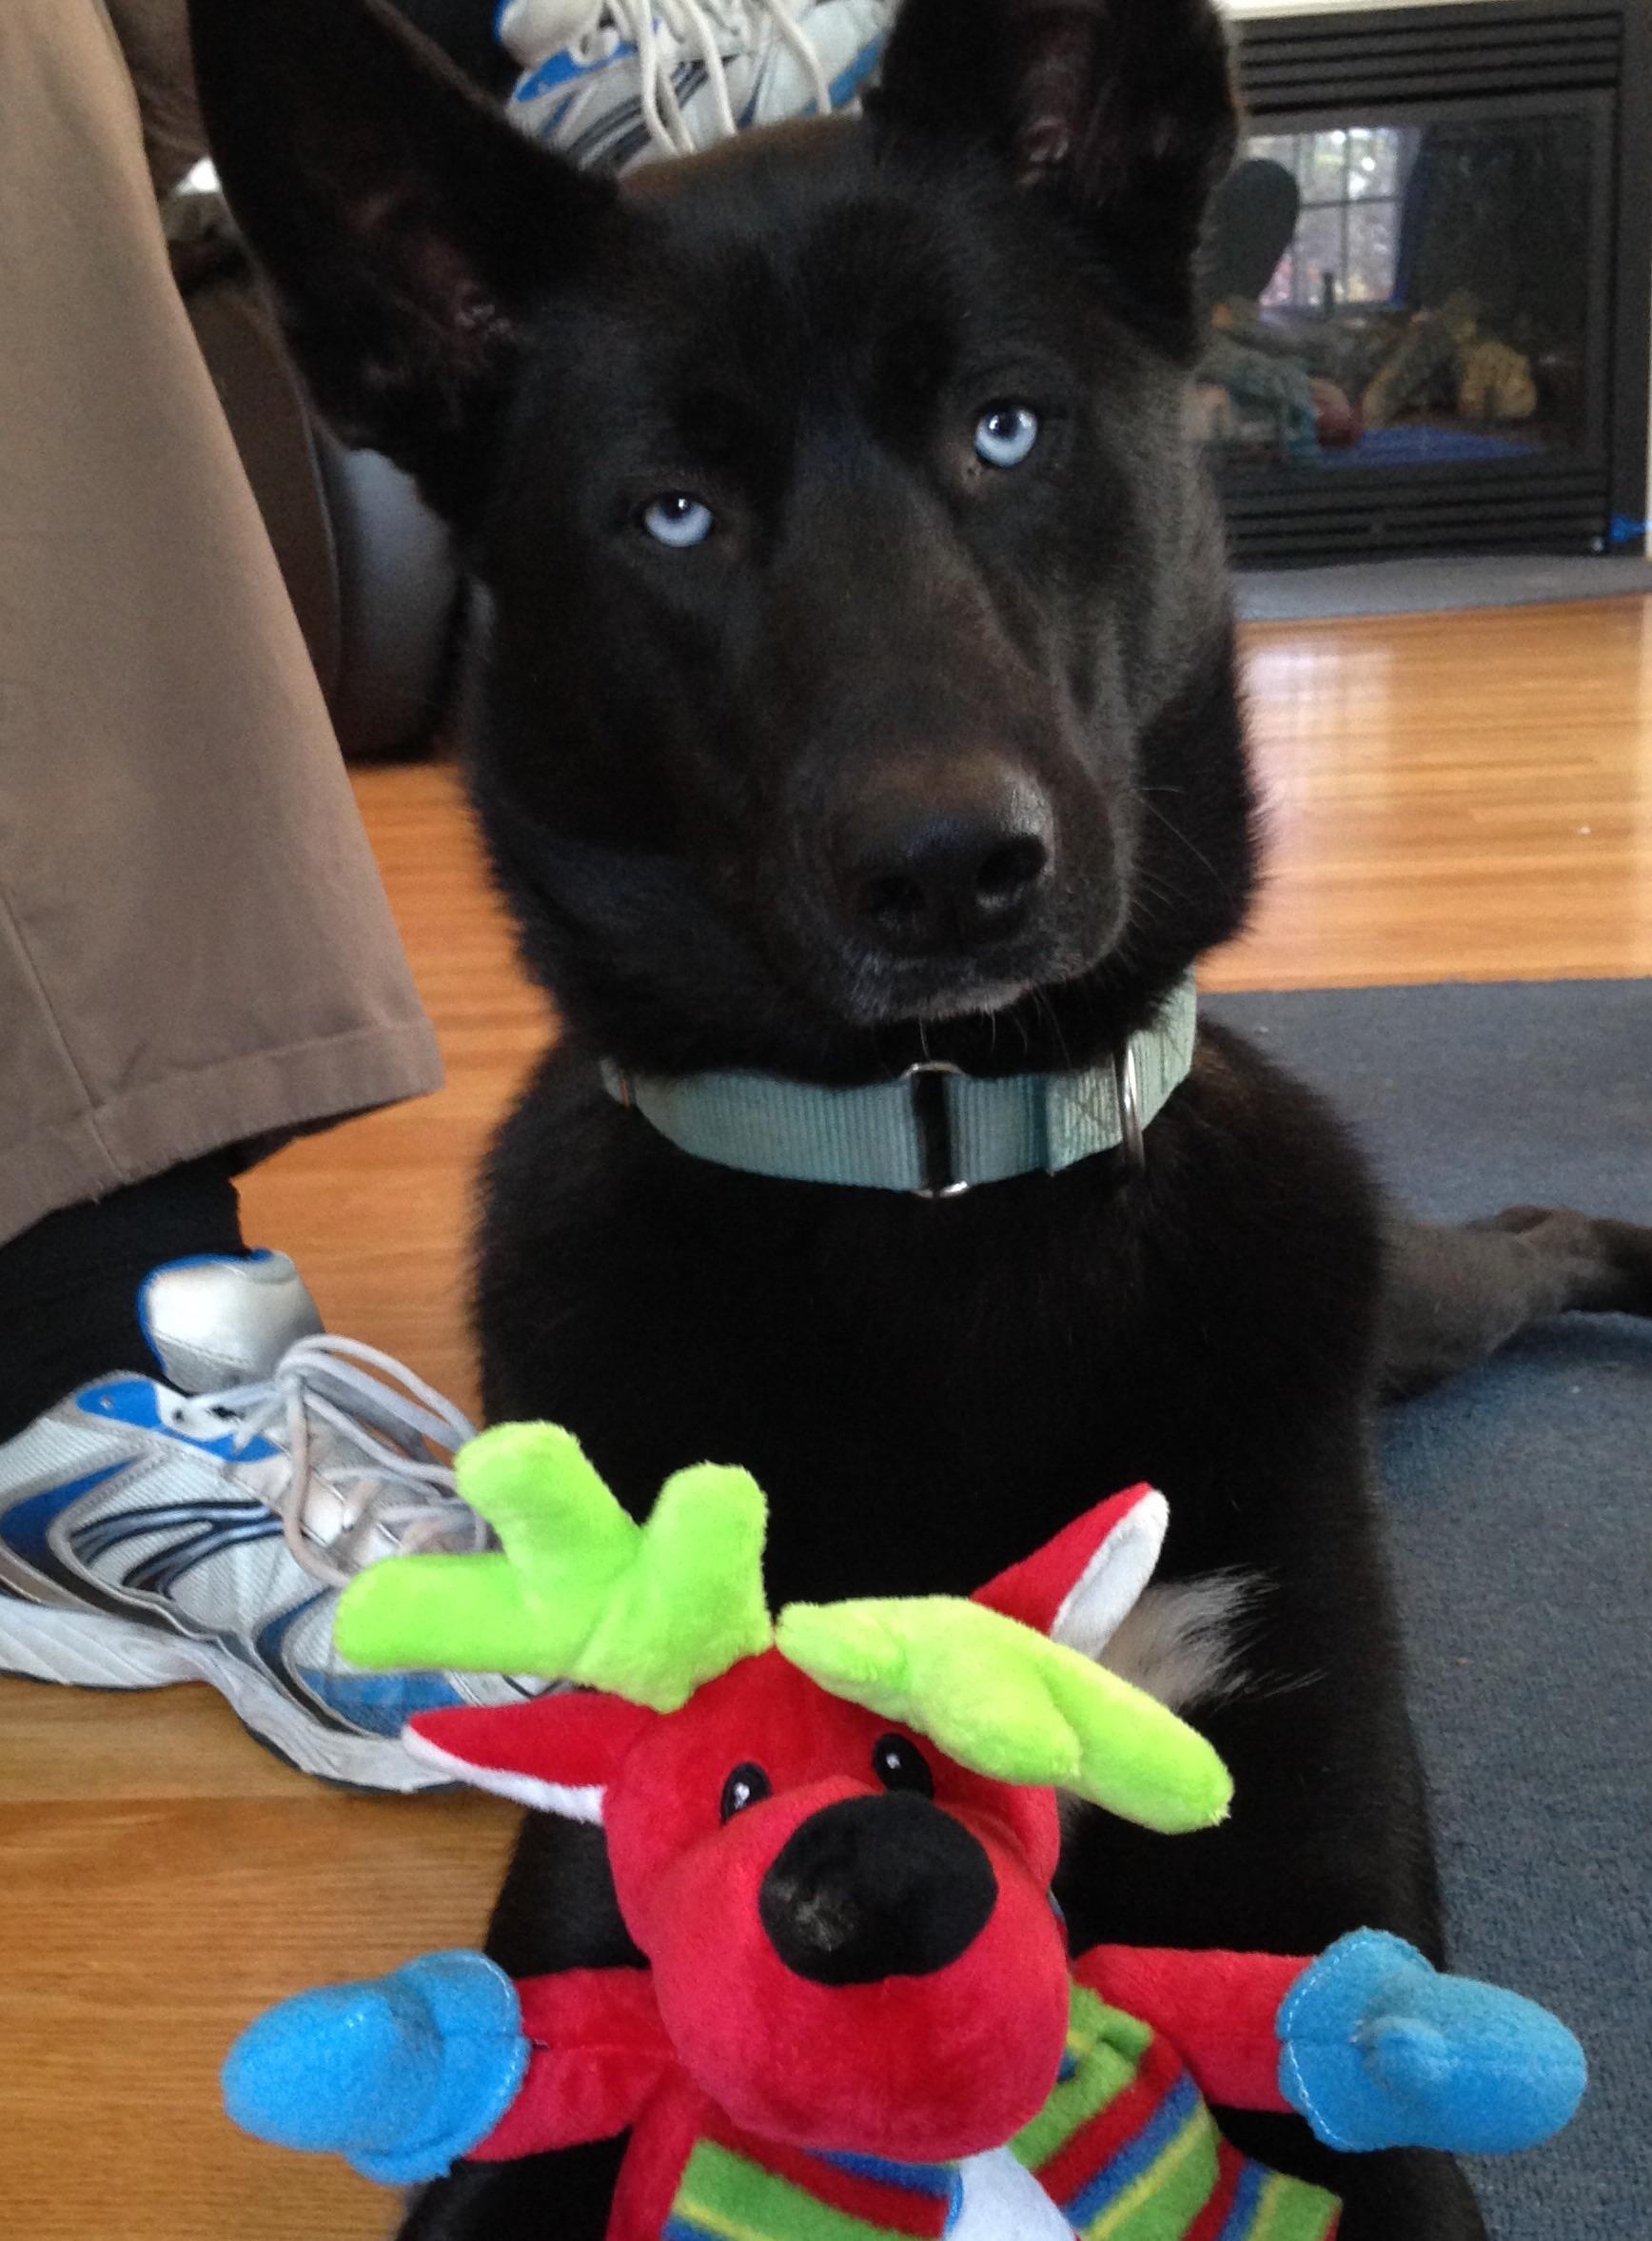 Merlin and his Christmas Reindeer, Professional Pet Sitting Etc